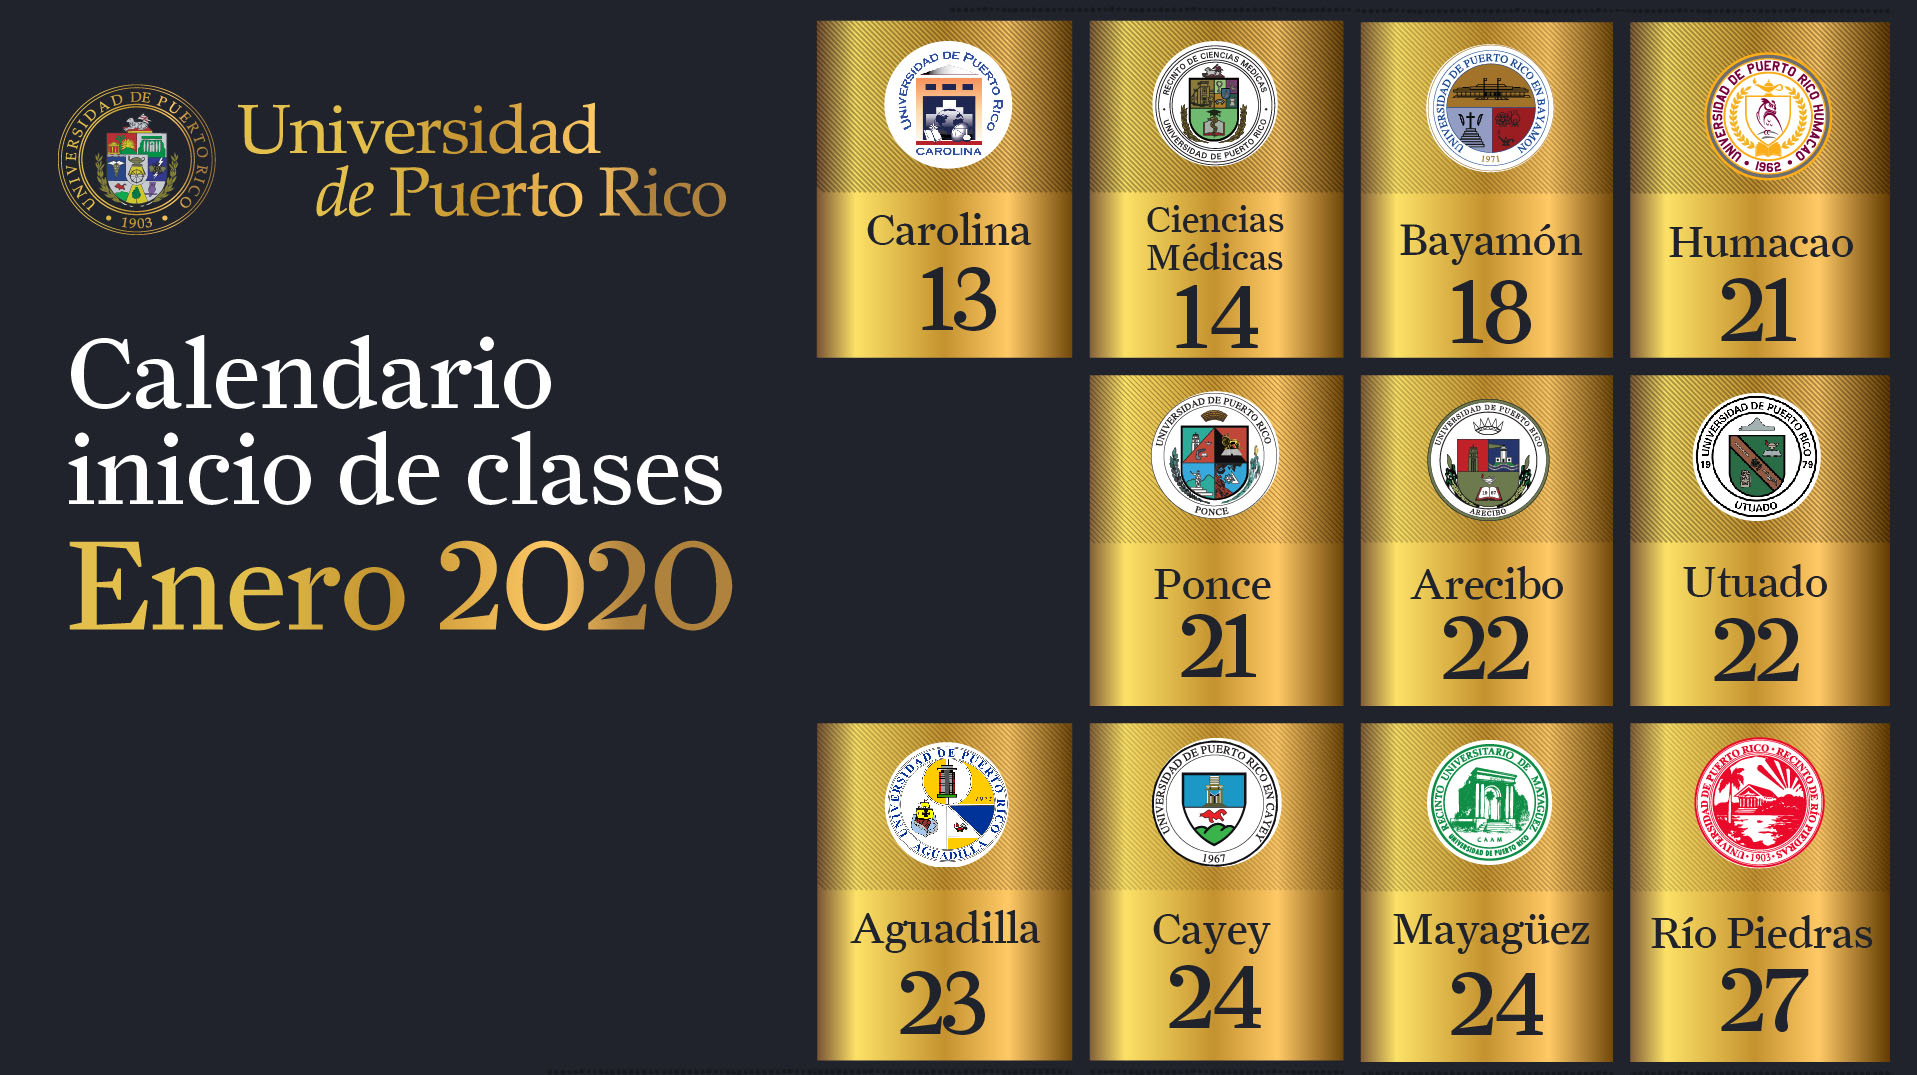 Calendario Inicio de clases UPR 2020